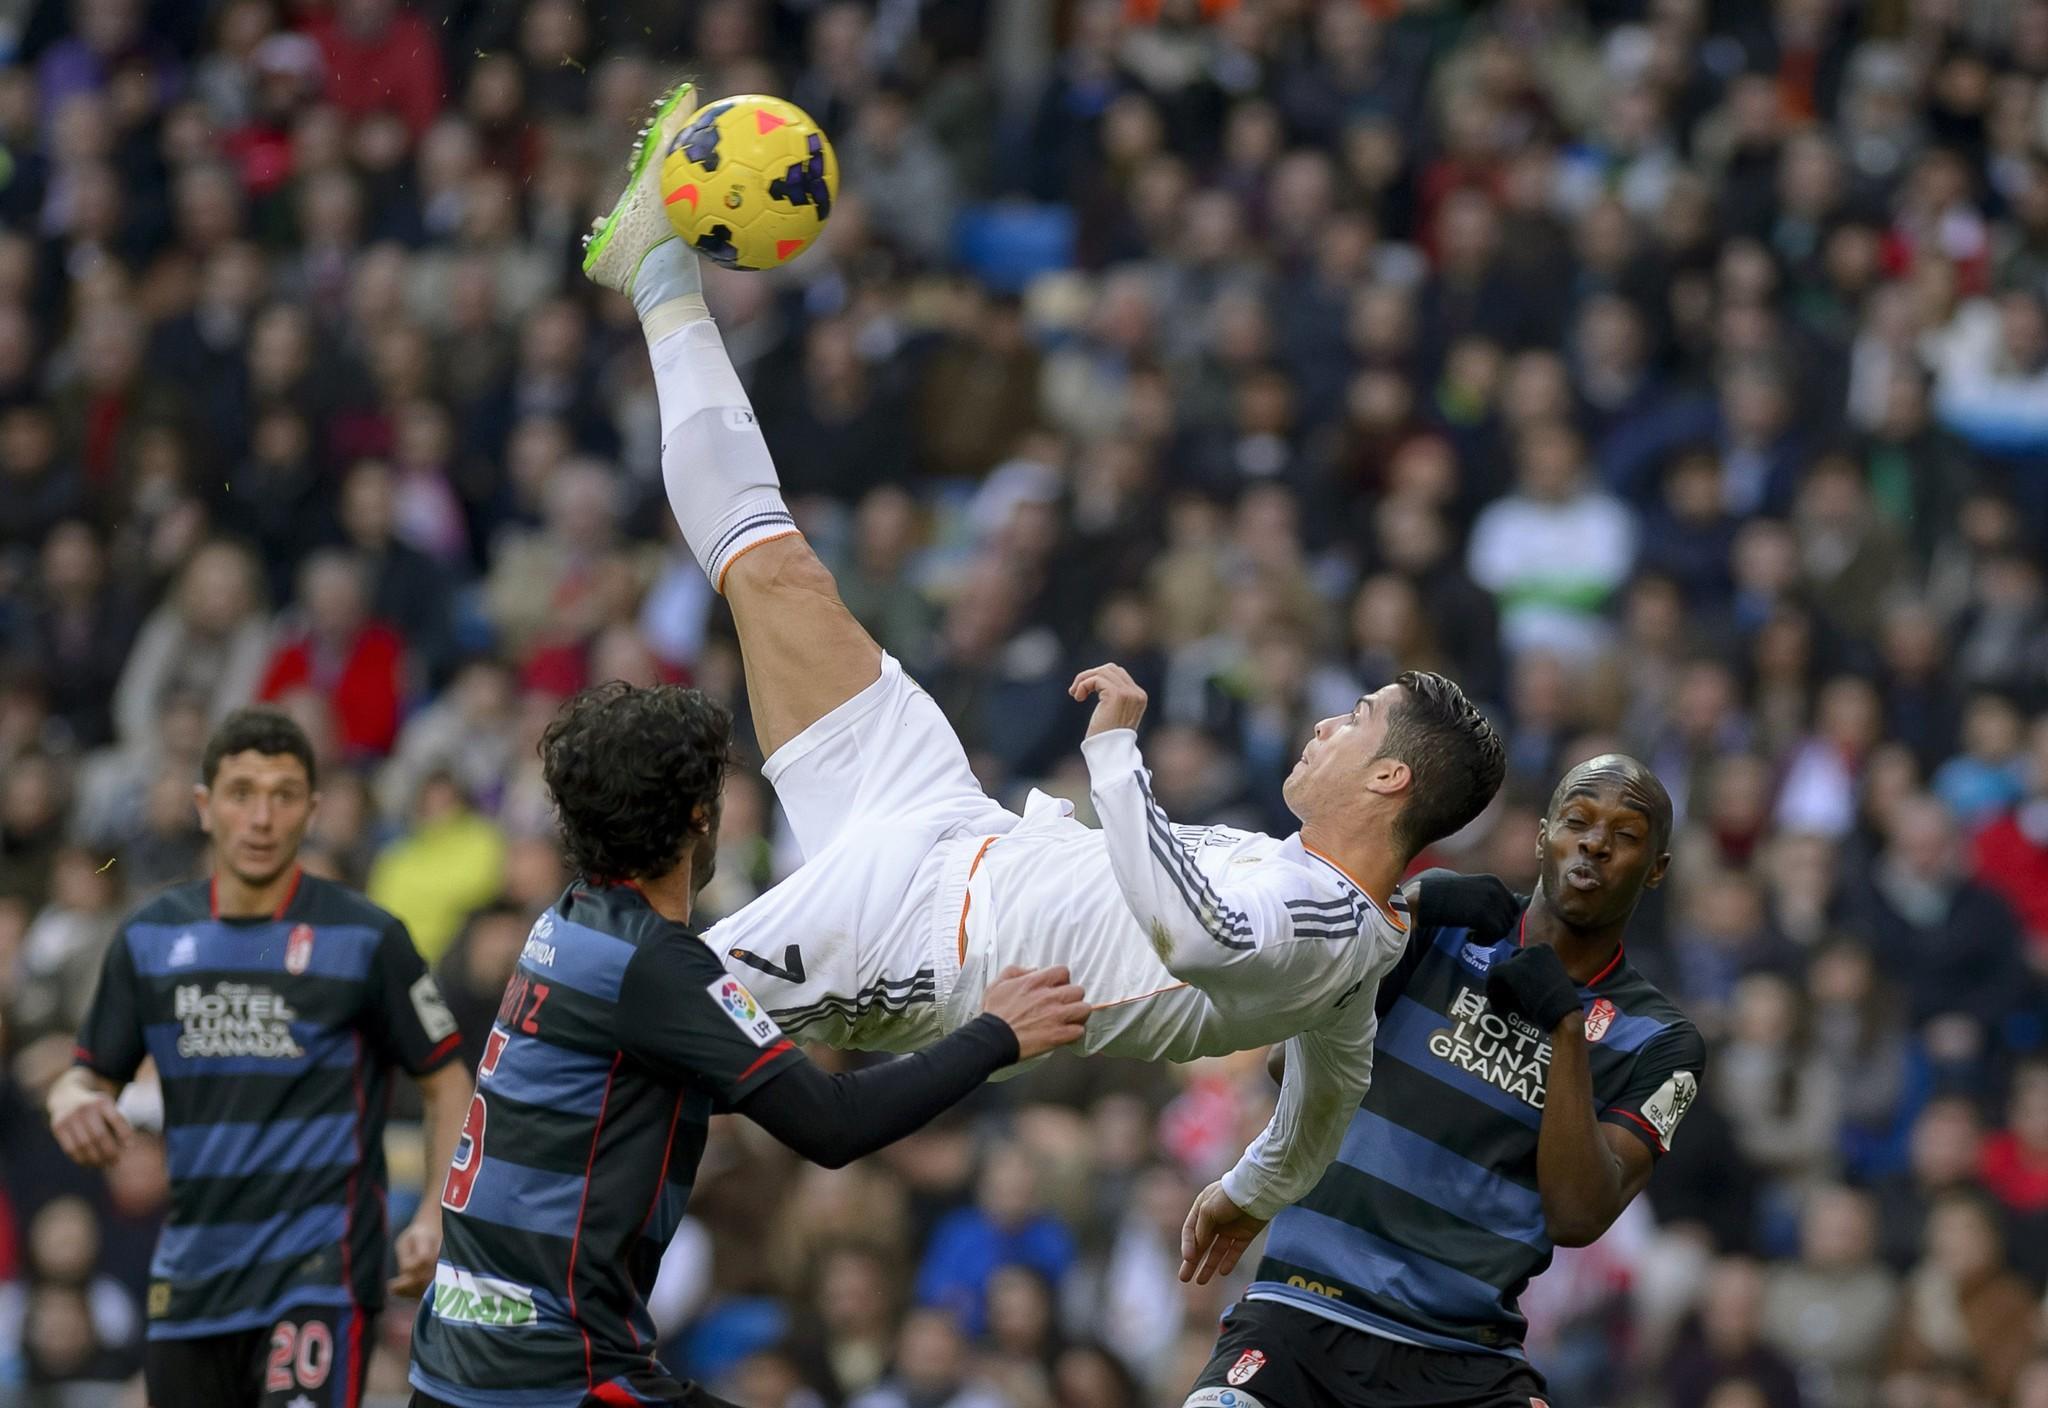 TOPSHOTS Real Madrid's Portuguese forward Cristiano Ronaldo (C) kicks the ball during the Spanish league football match Real Madrid vs FC Granada at the Santiago Bernabeu stadium in Madrid on January 25, 2014.